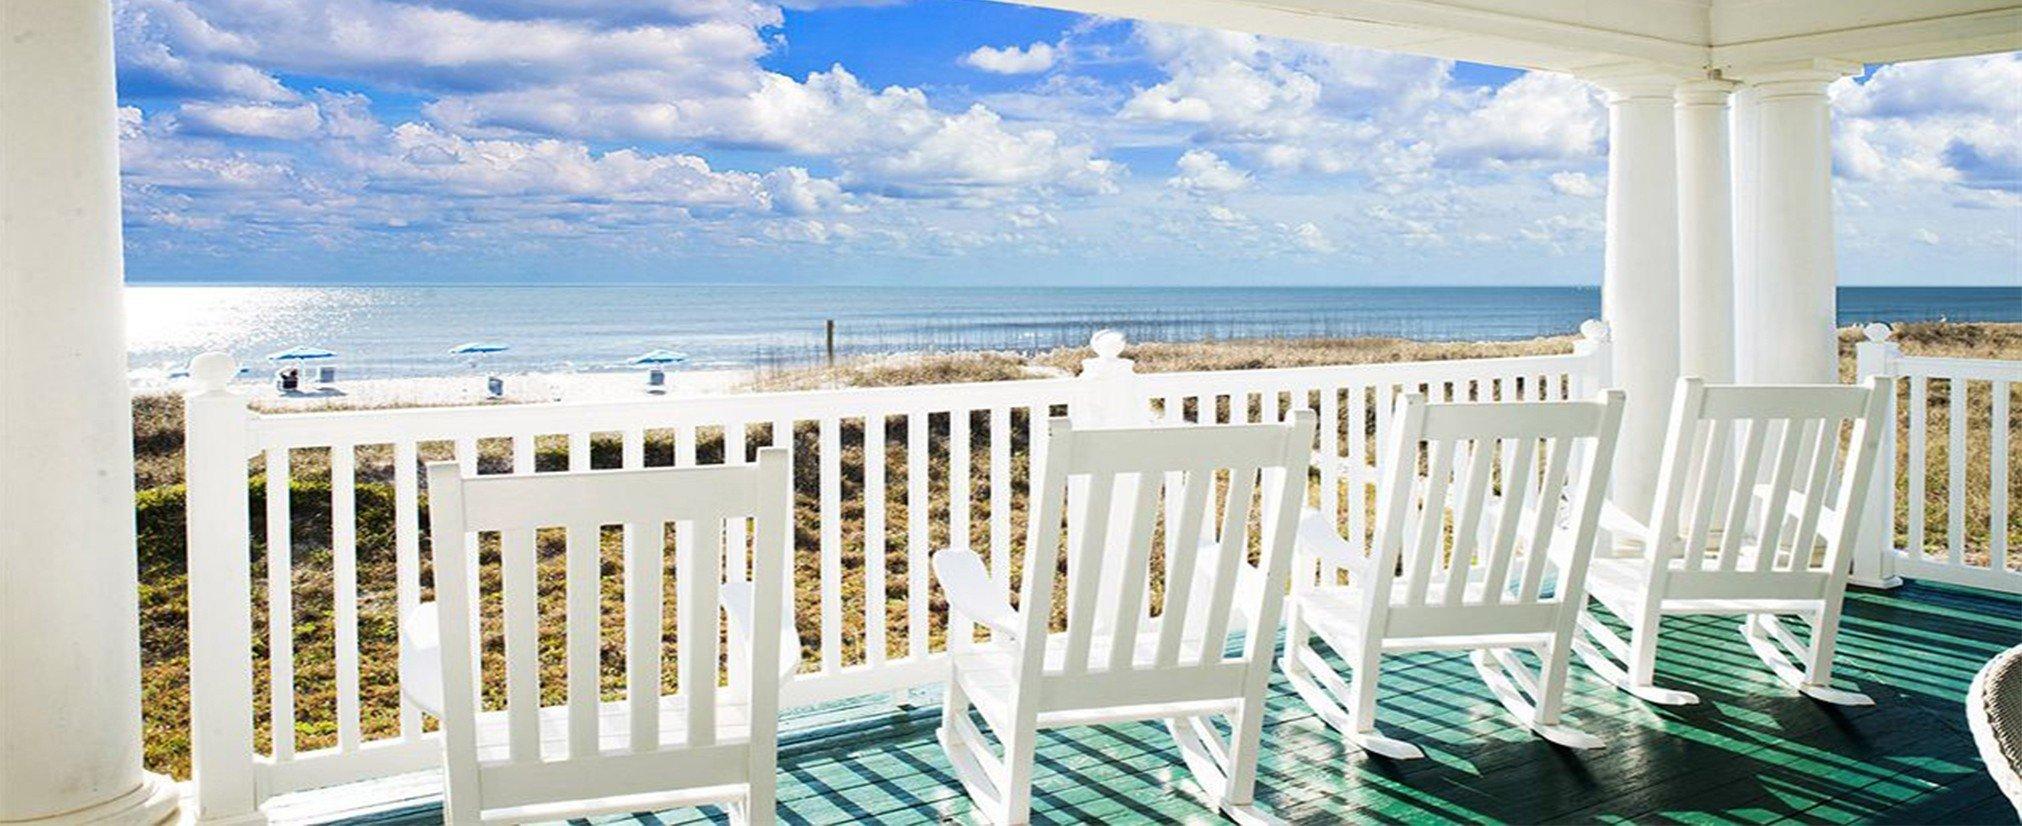 Hotels chair white property vacation estate caribbean Resort home Villa interior design porch cottage mansion Deck overlooking